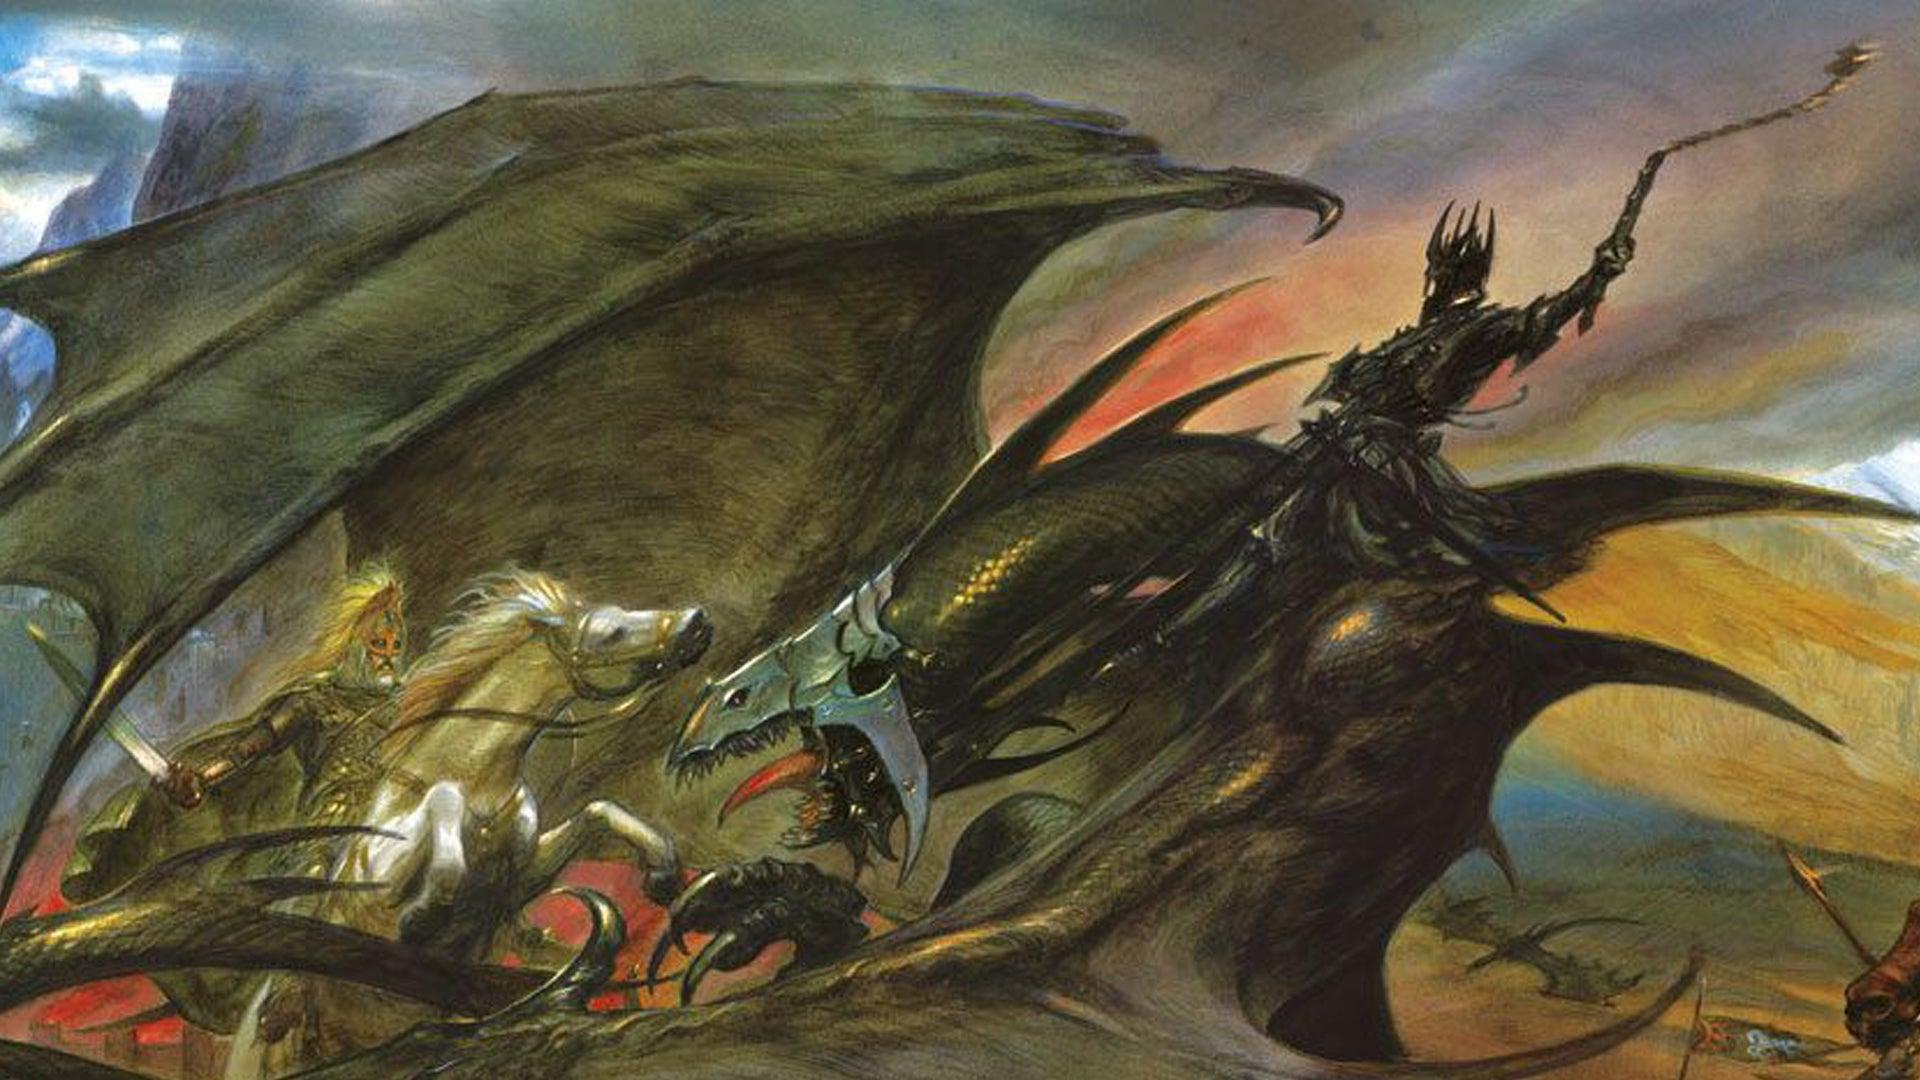 war-of-the-ring-2e-board-game-art.jpg